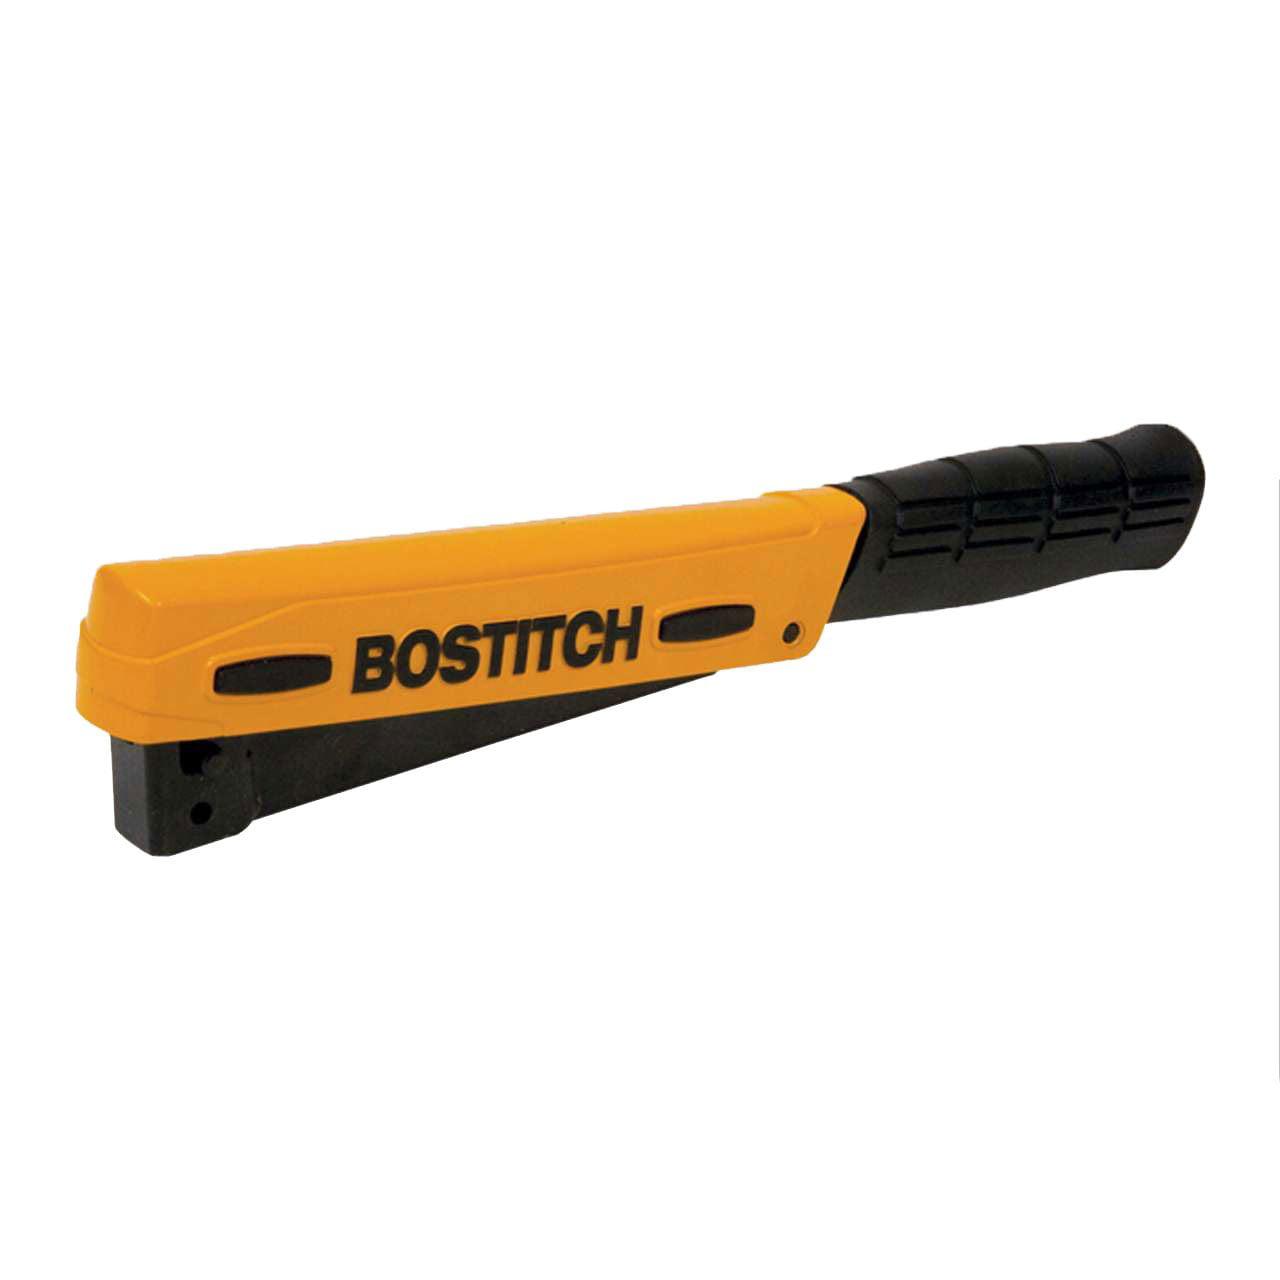 Bostitch Powercrown H30-8 Manual Hammer Tacker Staple Gun Stapler w  Holster by Bostitch